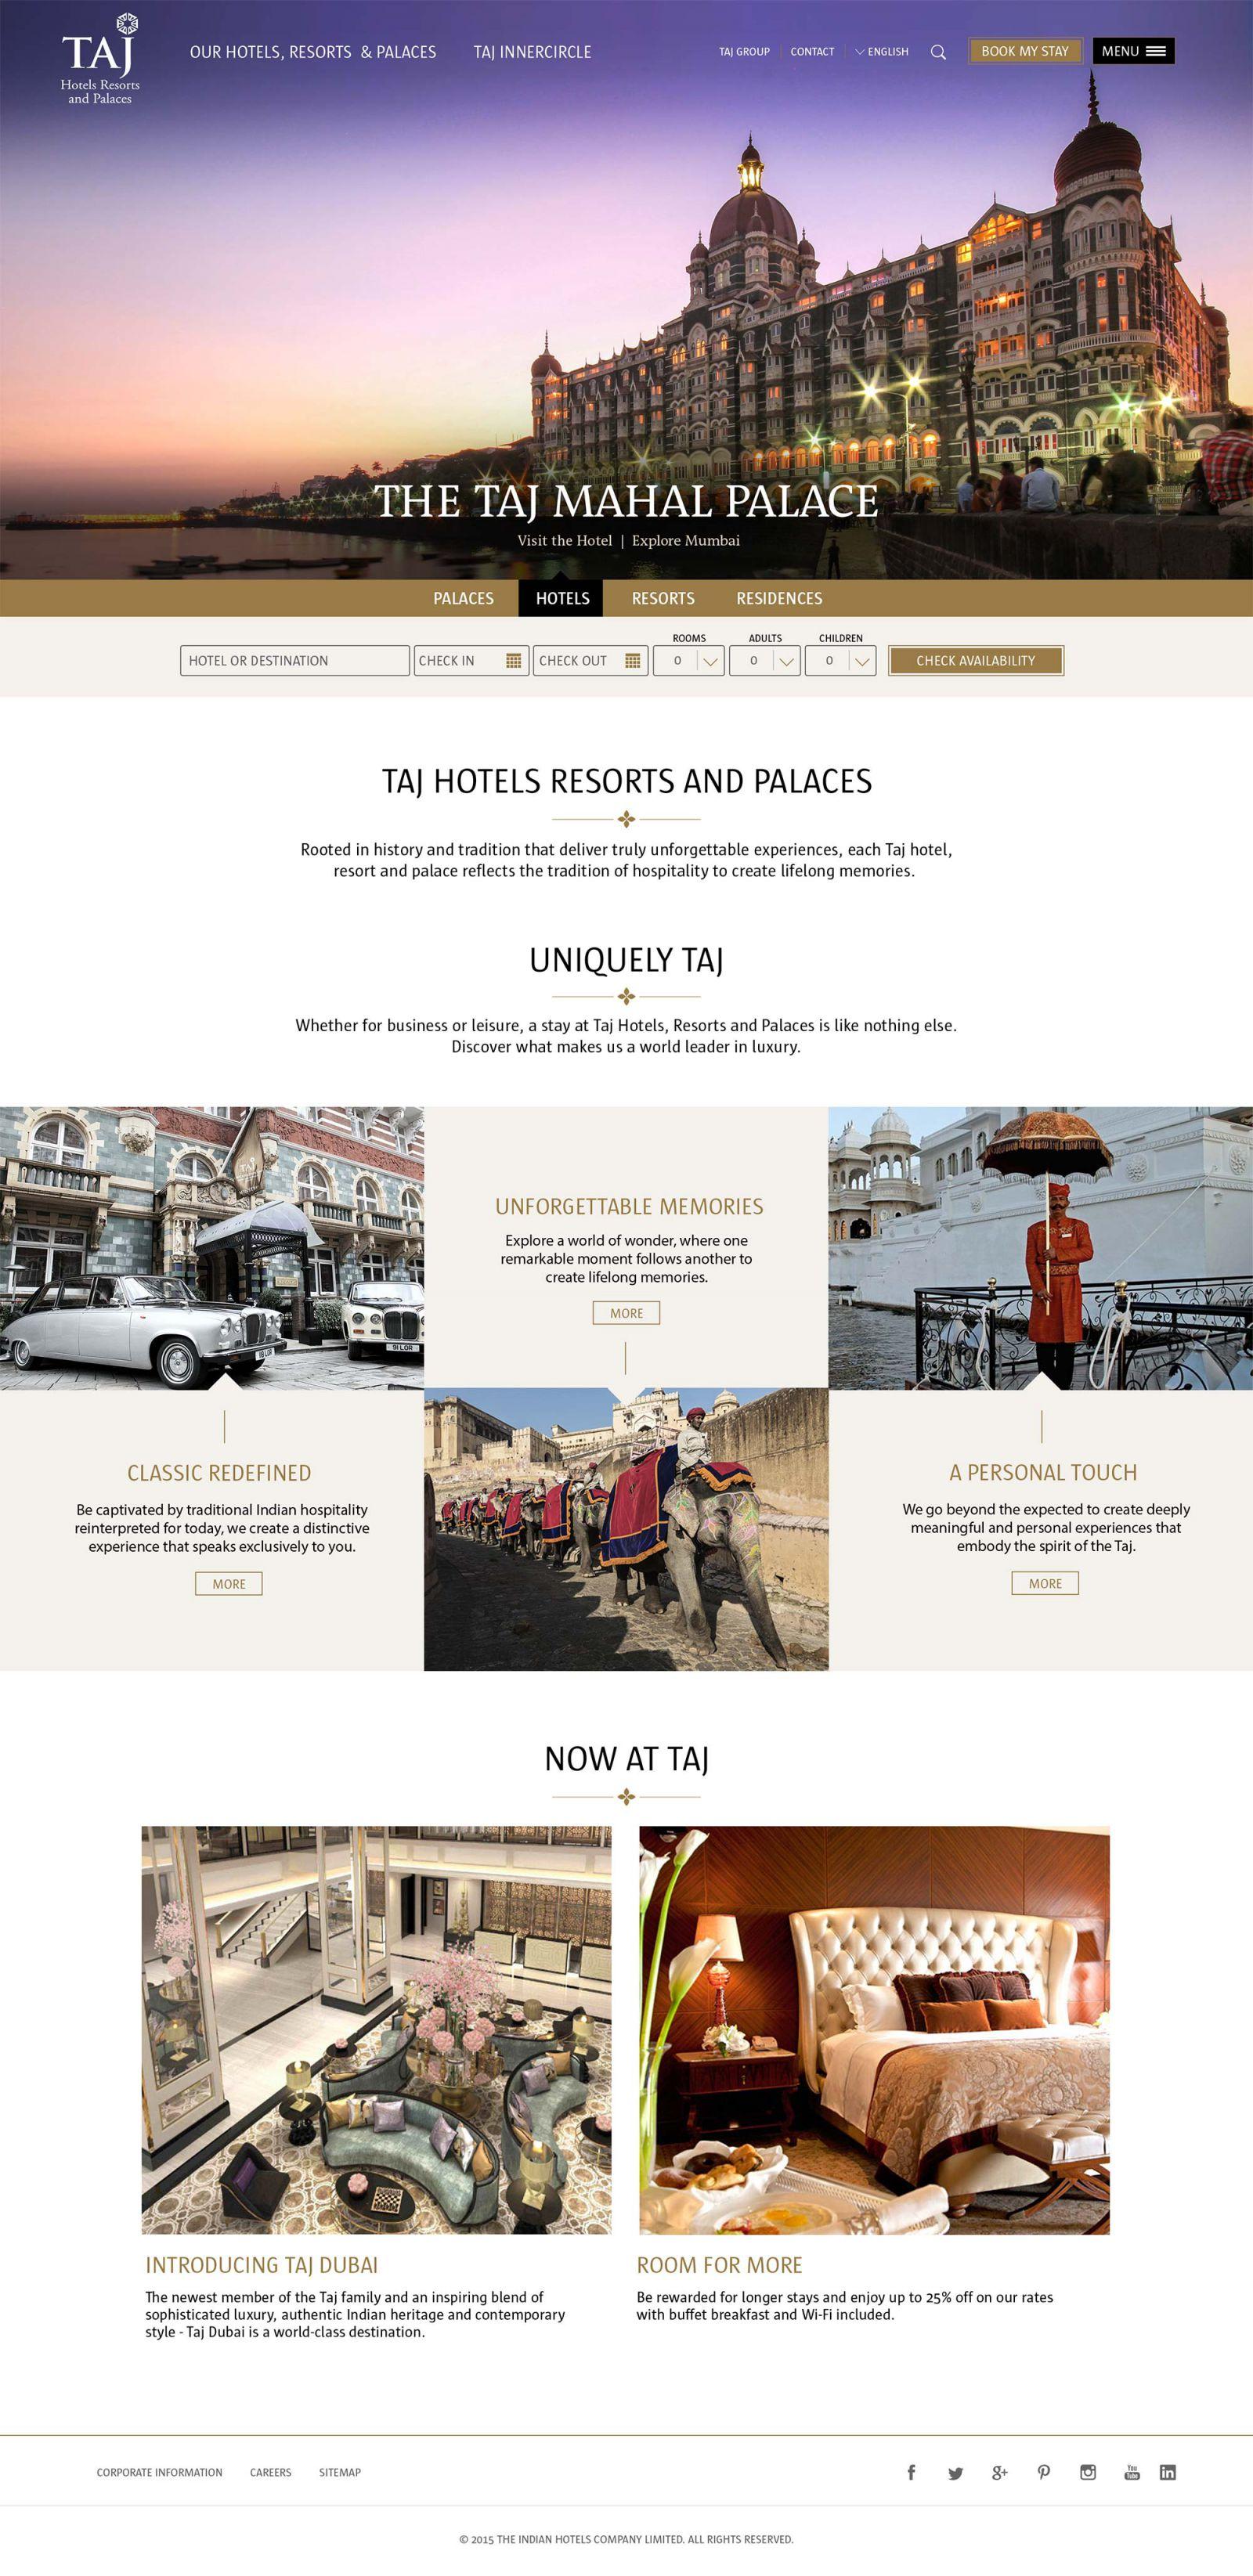 Taj Hotels Resorts and Palaces homepage